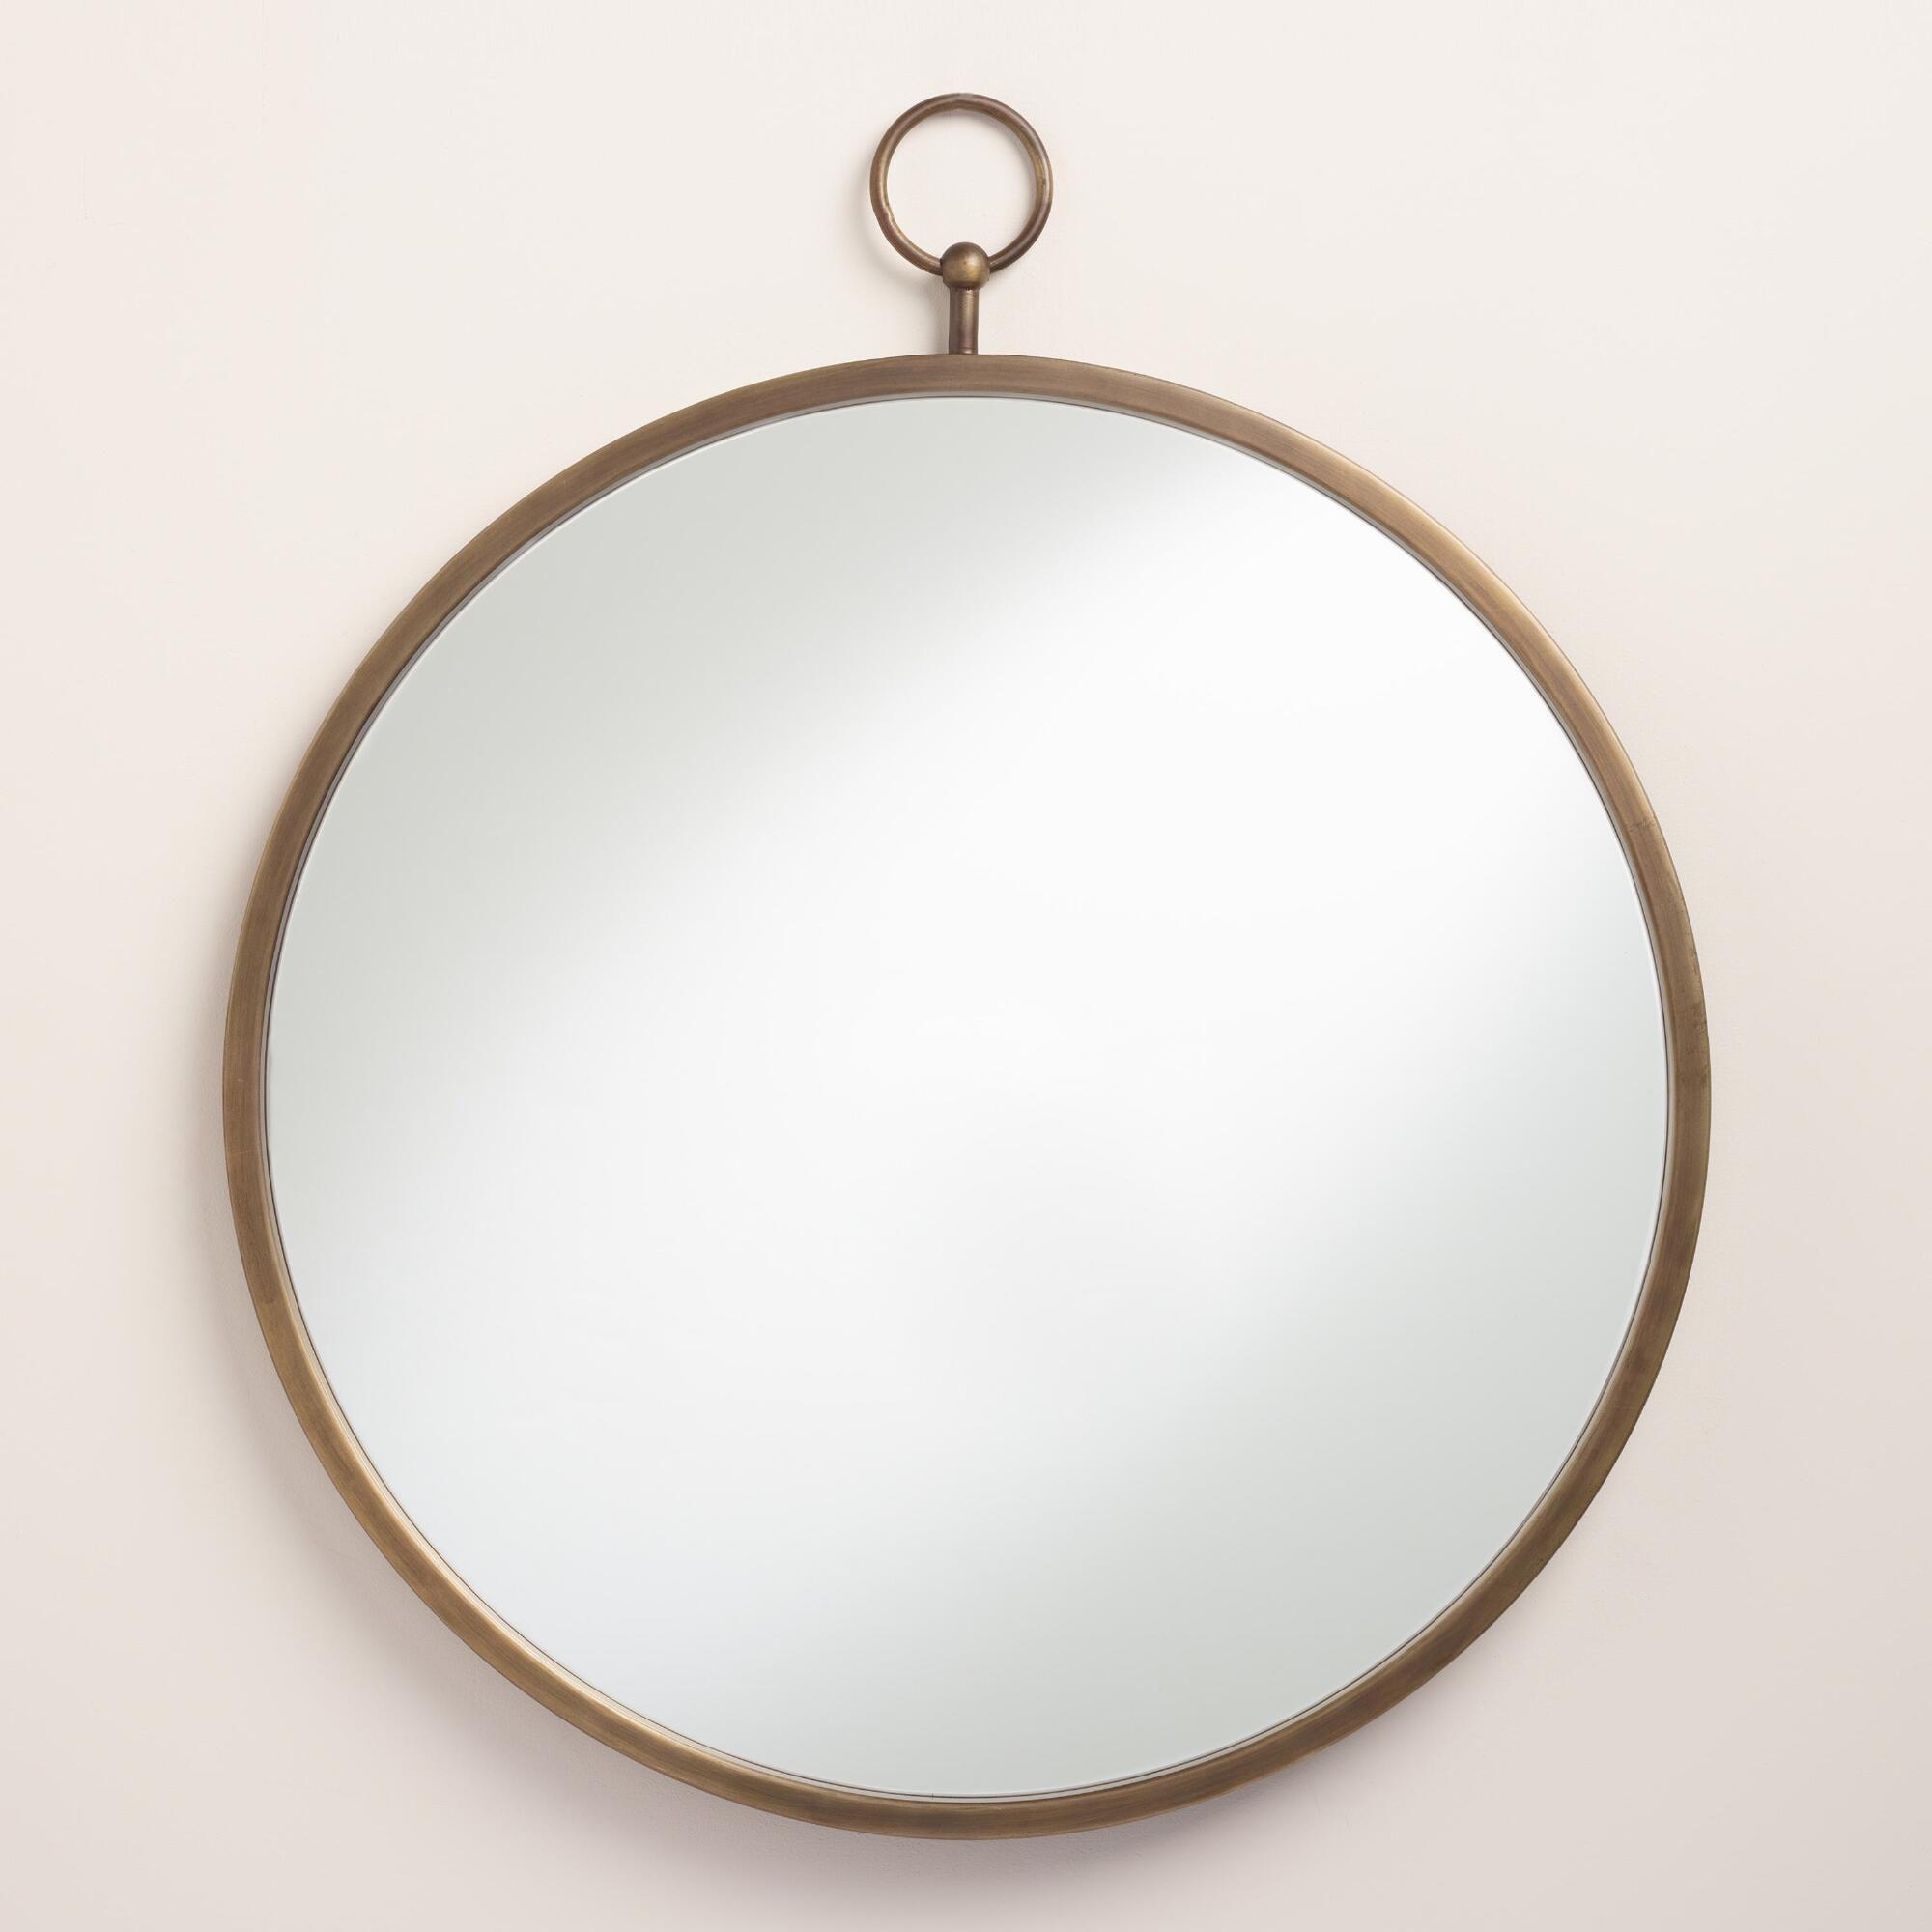 Brass metal loop mirror round mirrors antique brass and for Vintage mirror